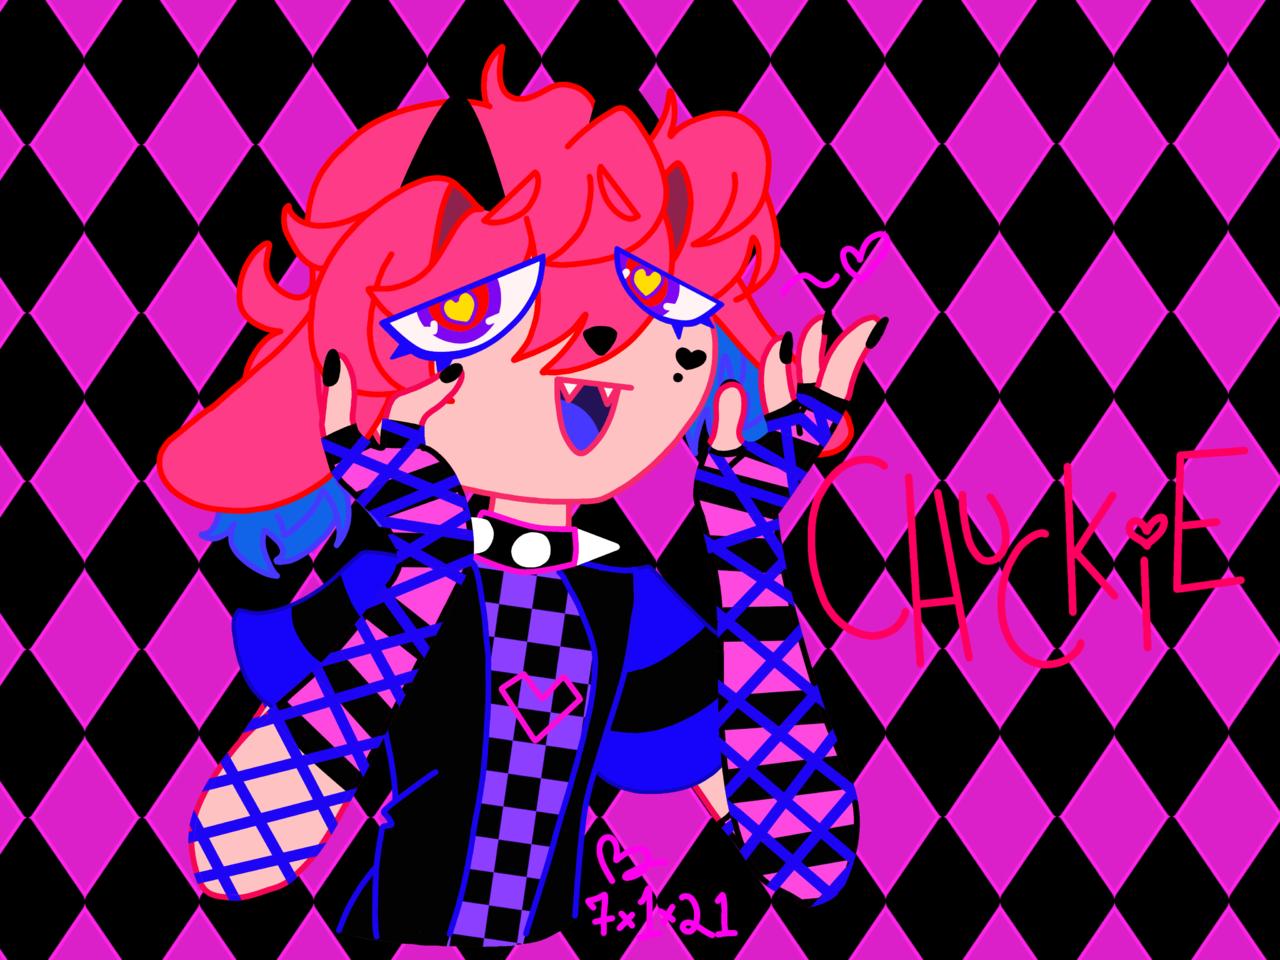 Chuckie ~💗 Illust of ẞ r e d Neon pink Alt oc Sm!ley